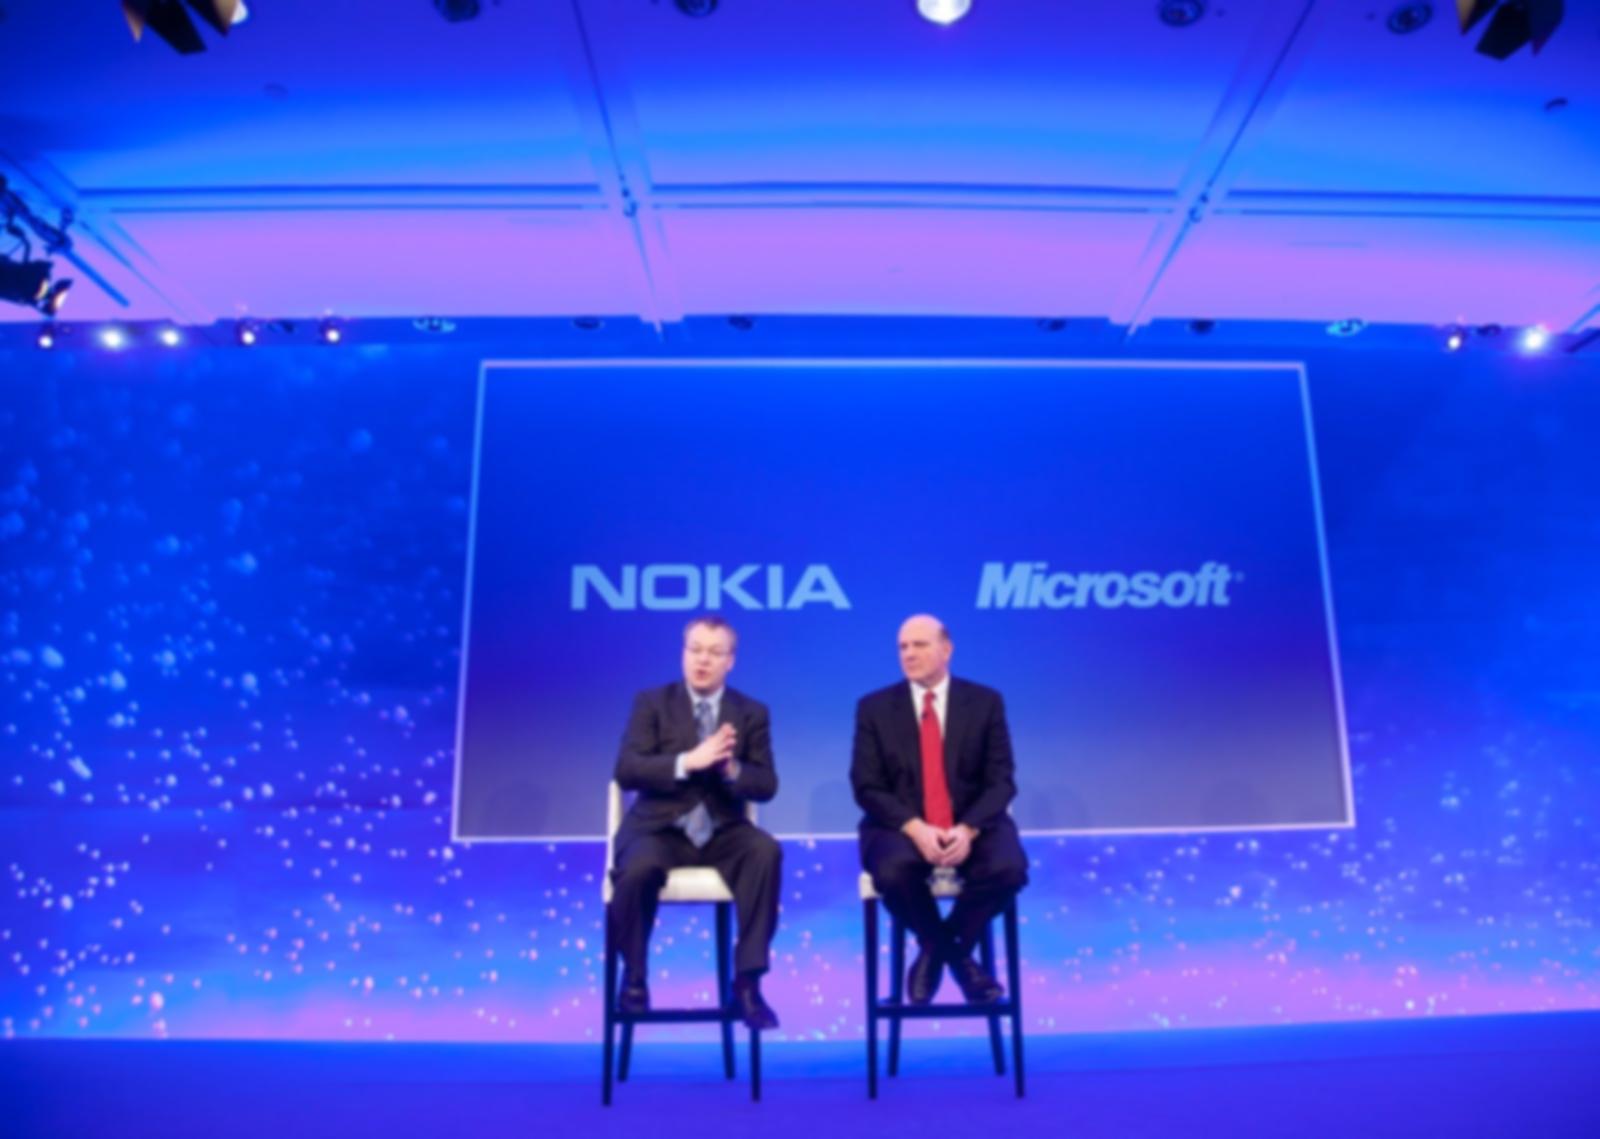 Nokia and Microsoft